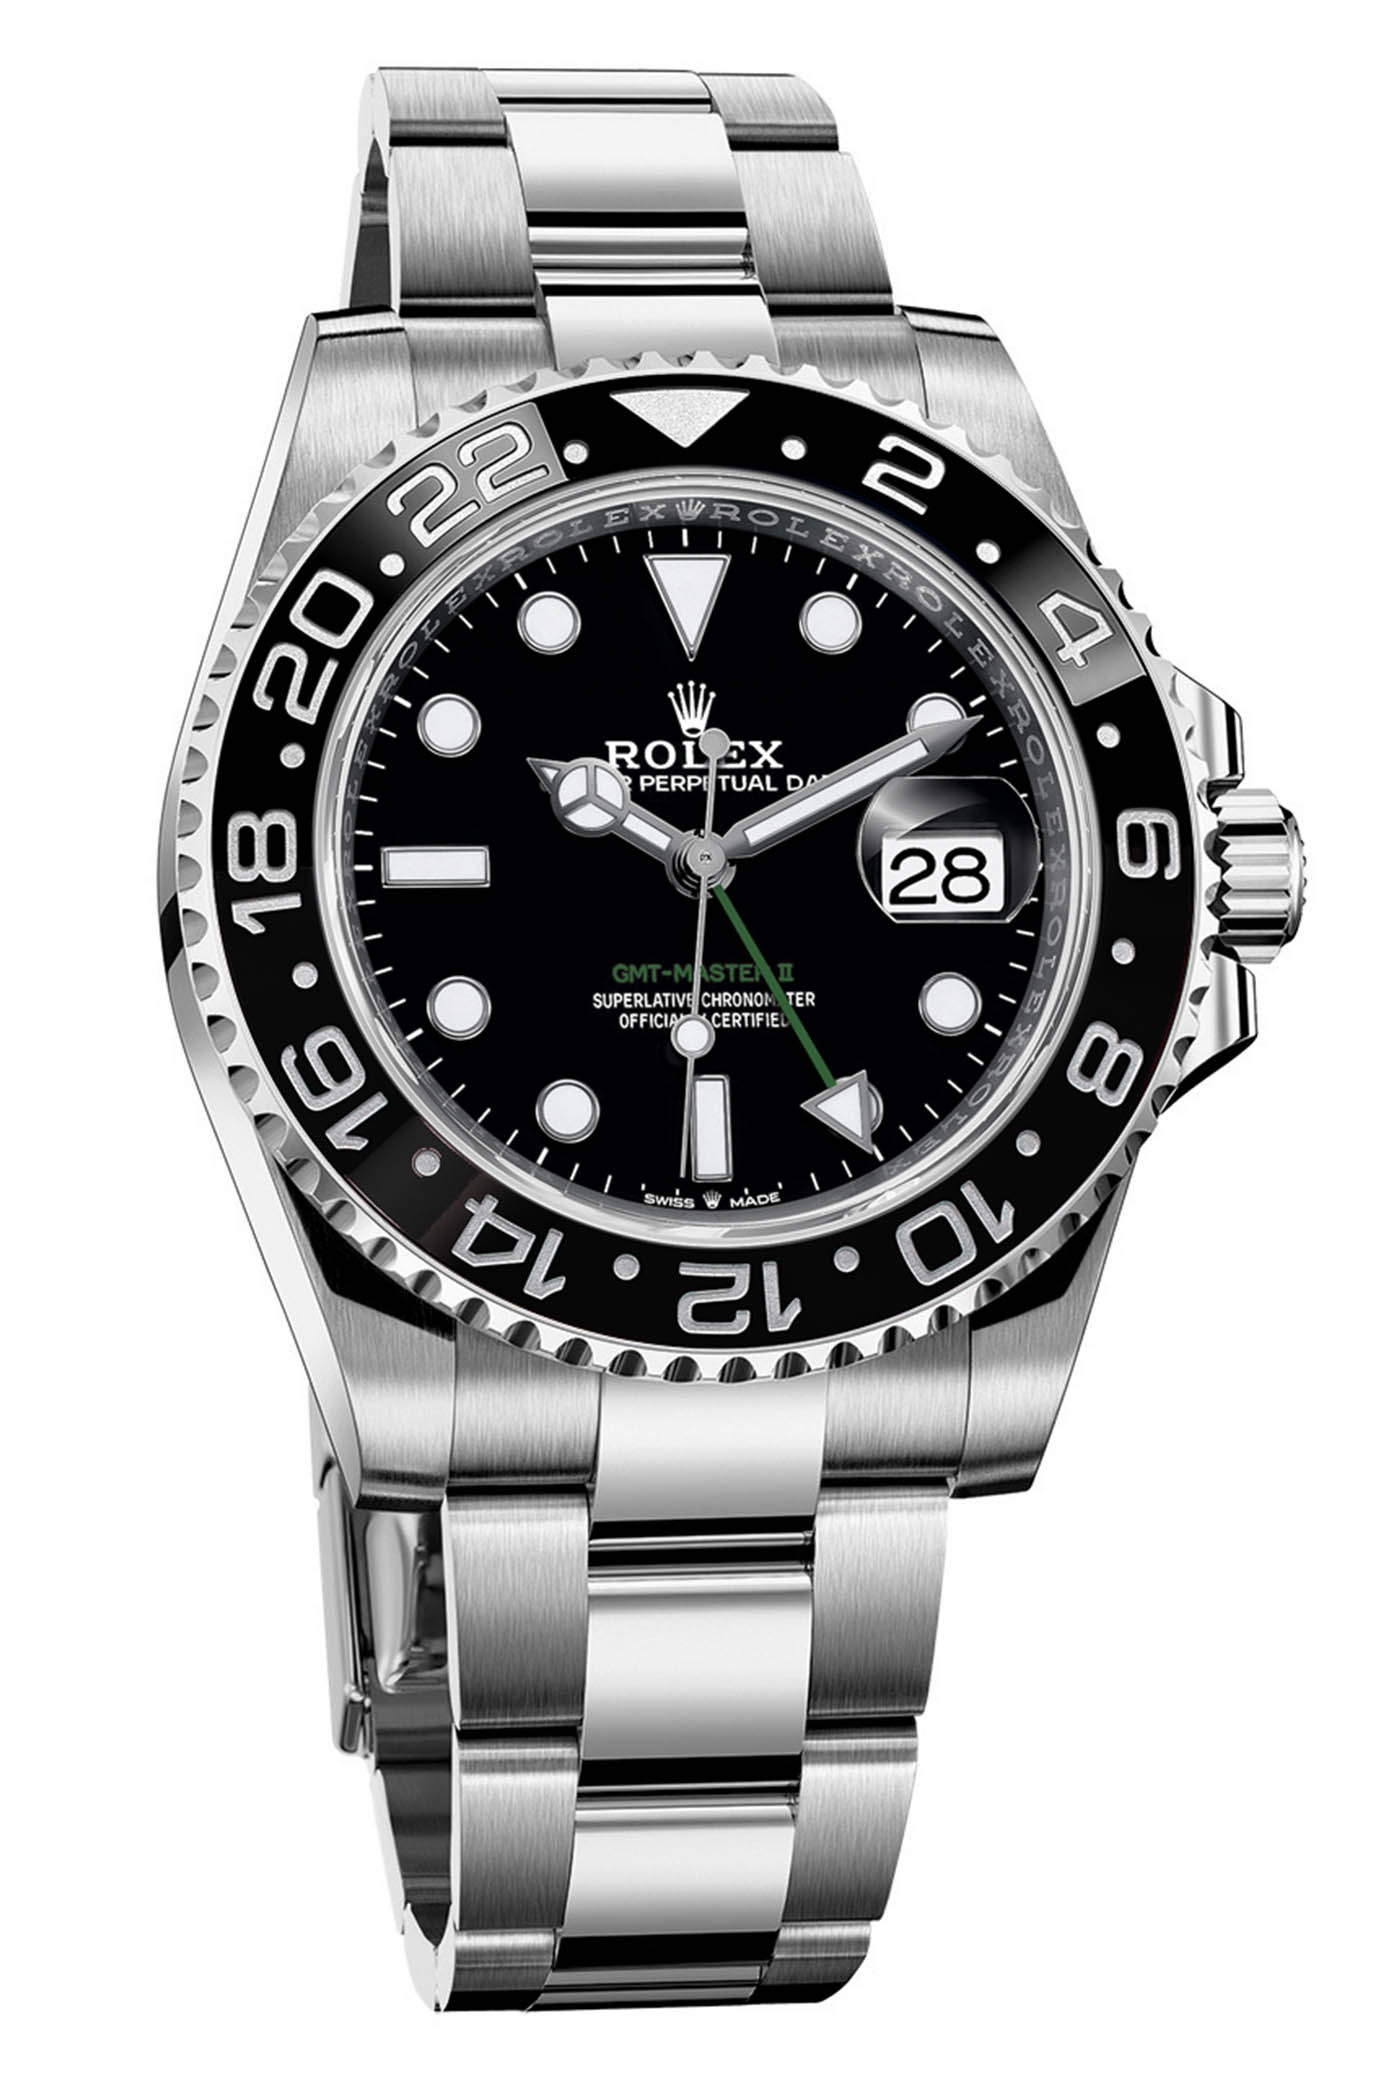 Rolex GMT Master II Steel Black Bezel Jubilee Calibre 3285 ref 126710LN - Rolex Baselworld 2019 - Rolex 2019 Predictions